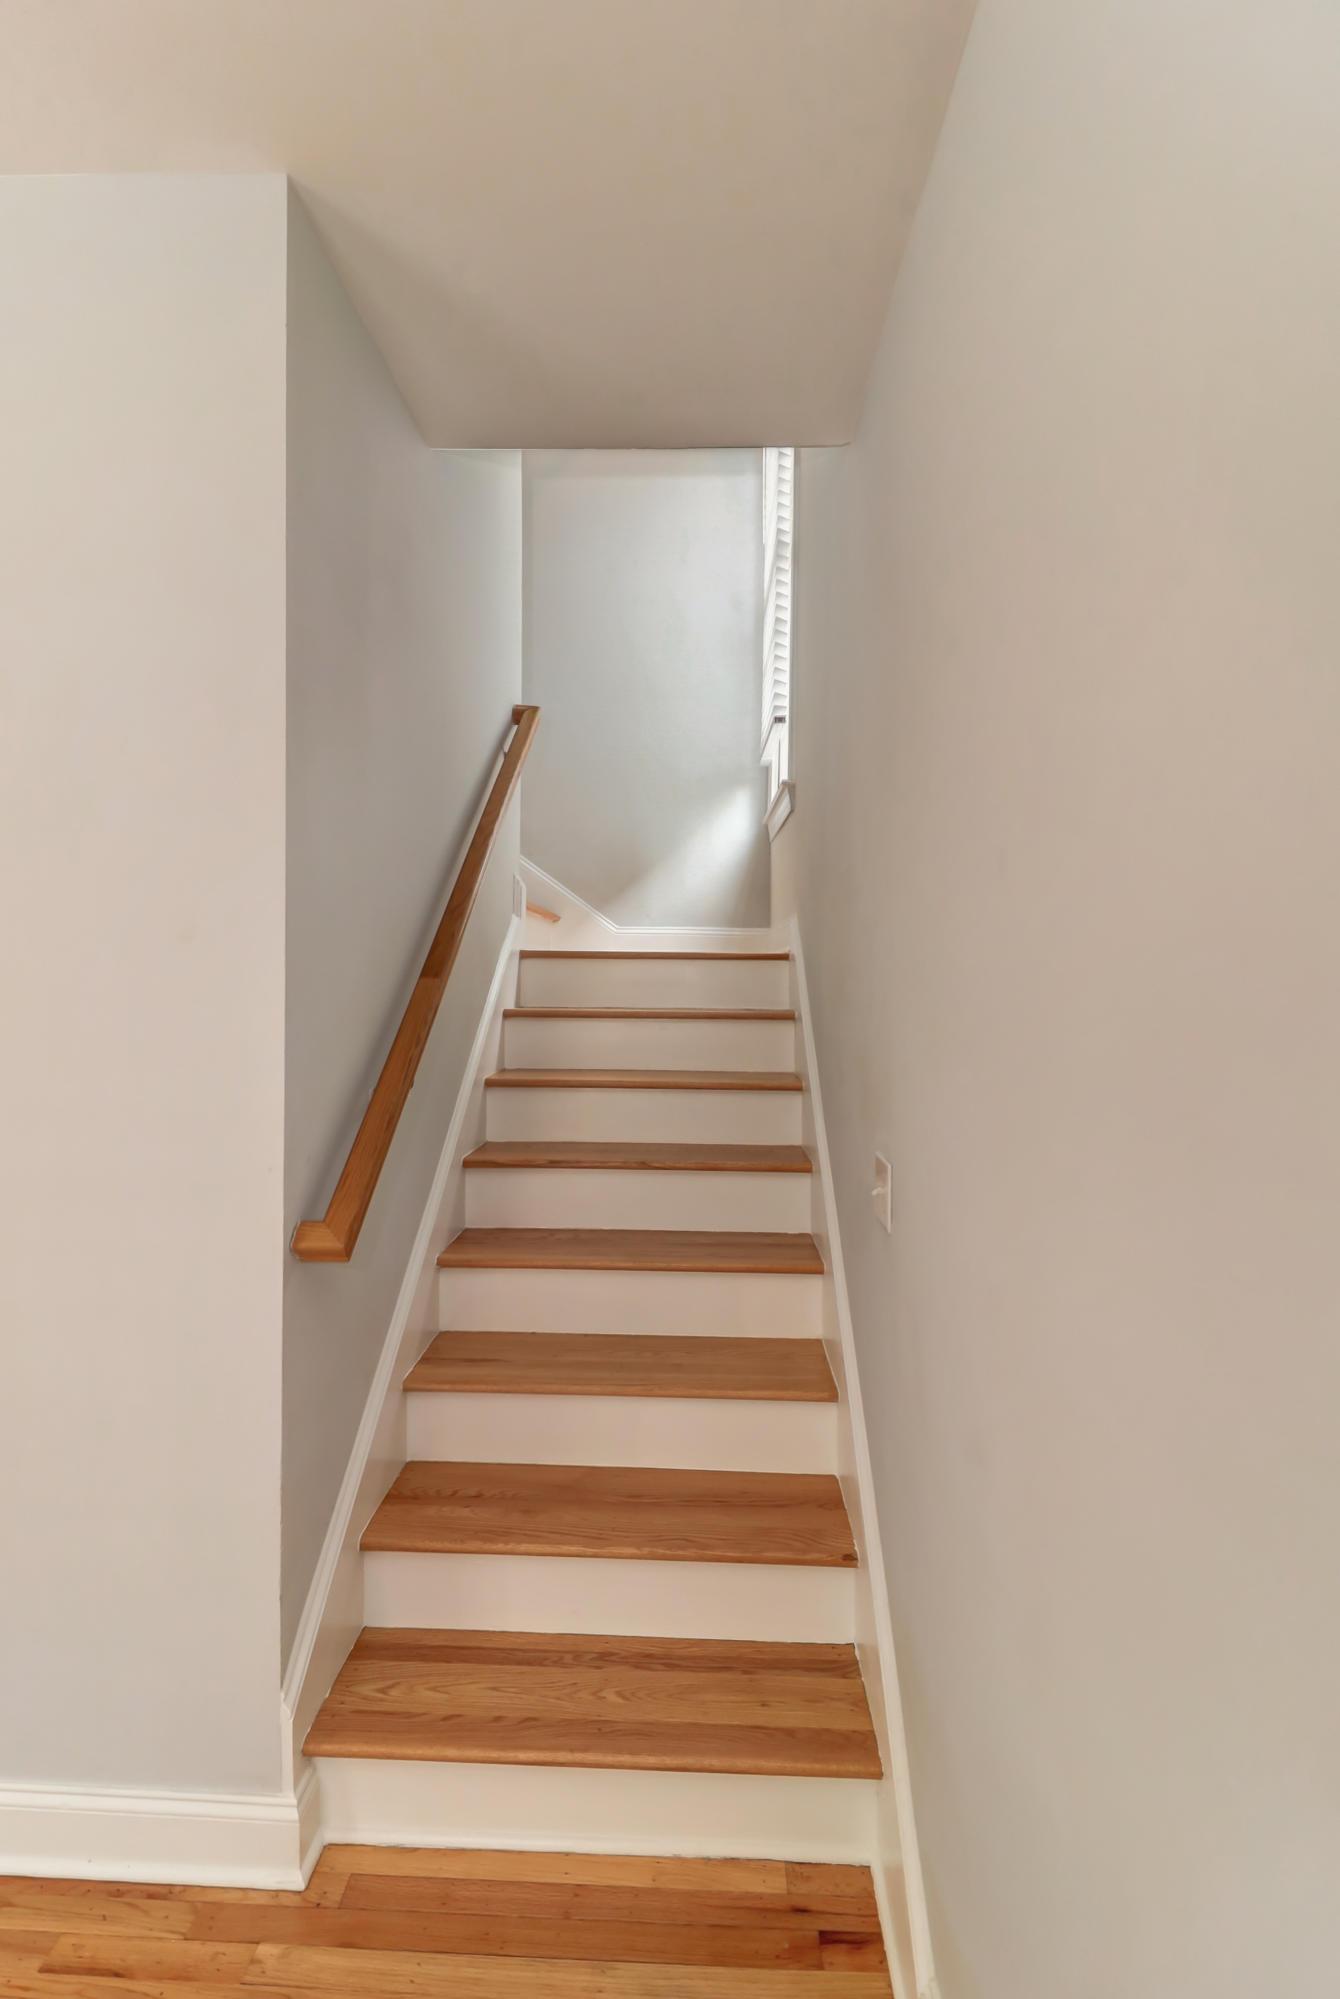 Radcliffeborough Homes For Sale - 5 Radcliffe, Charleston, SC - 25